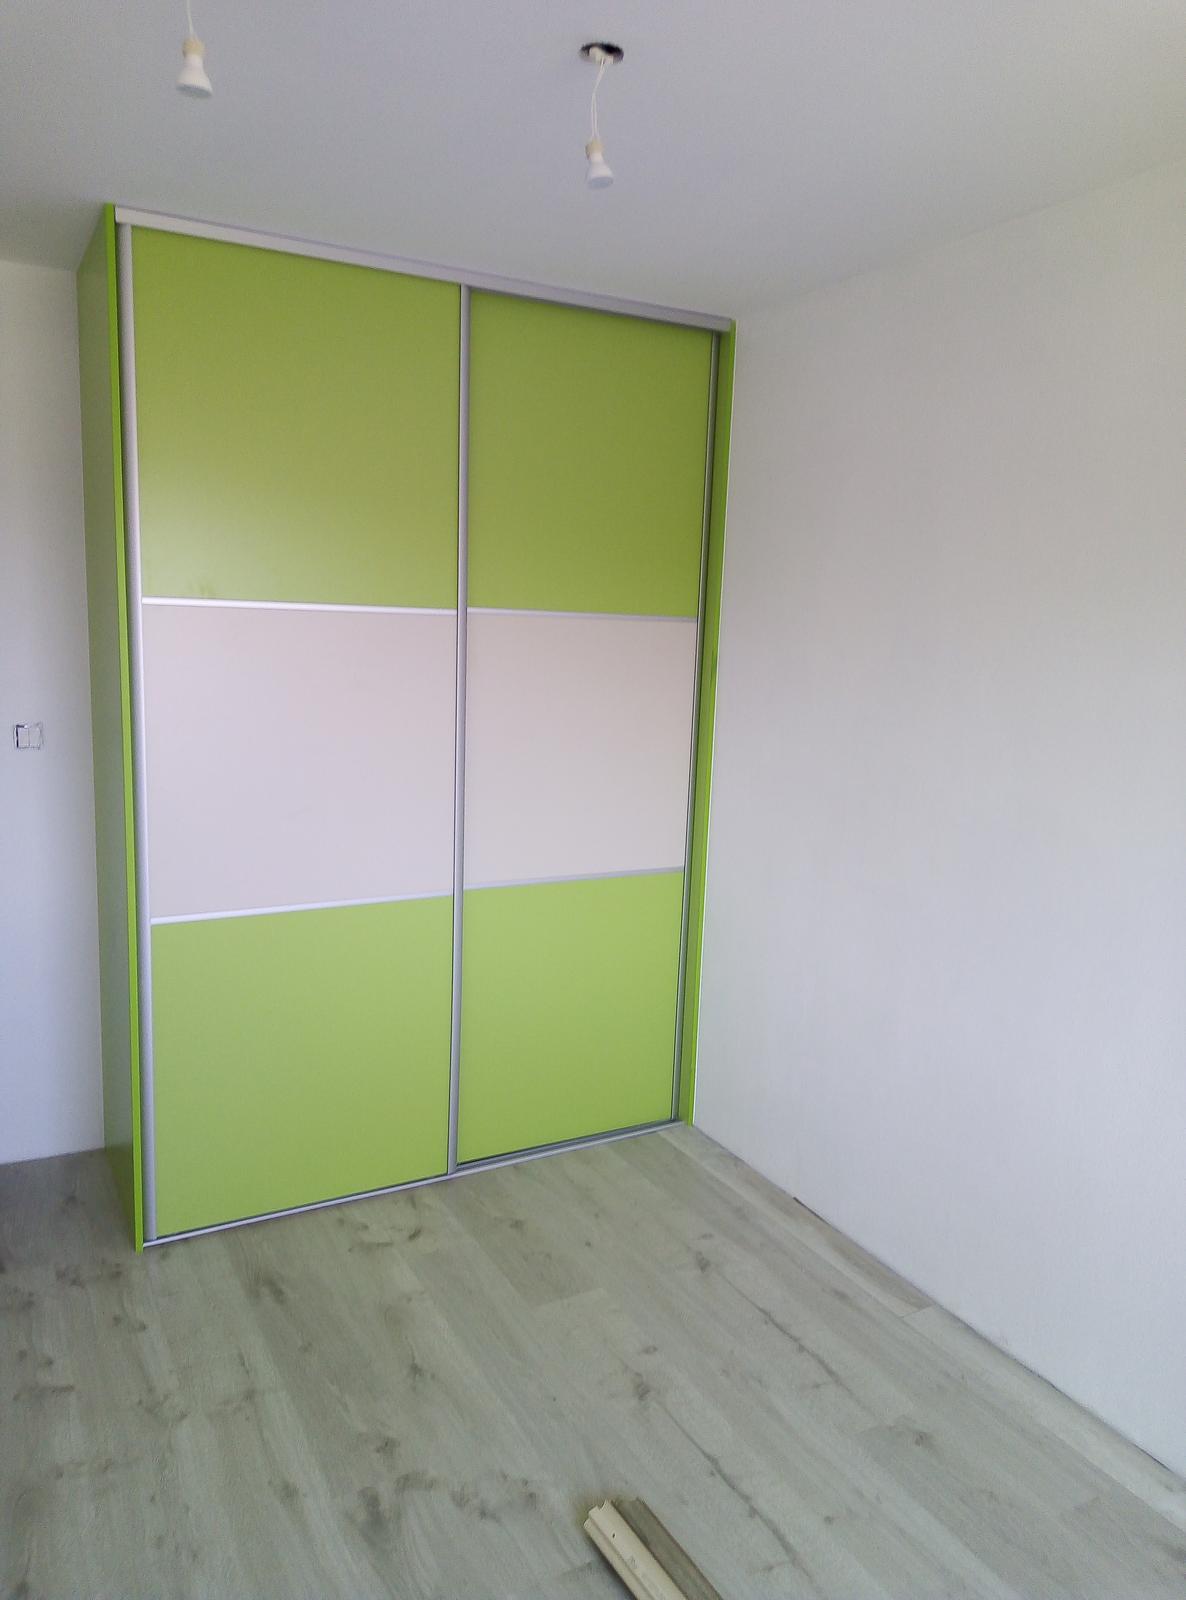 Vstavané skrine Martin Benko Bošany - Obrázok č. 19